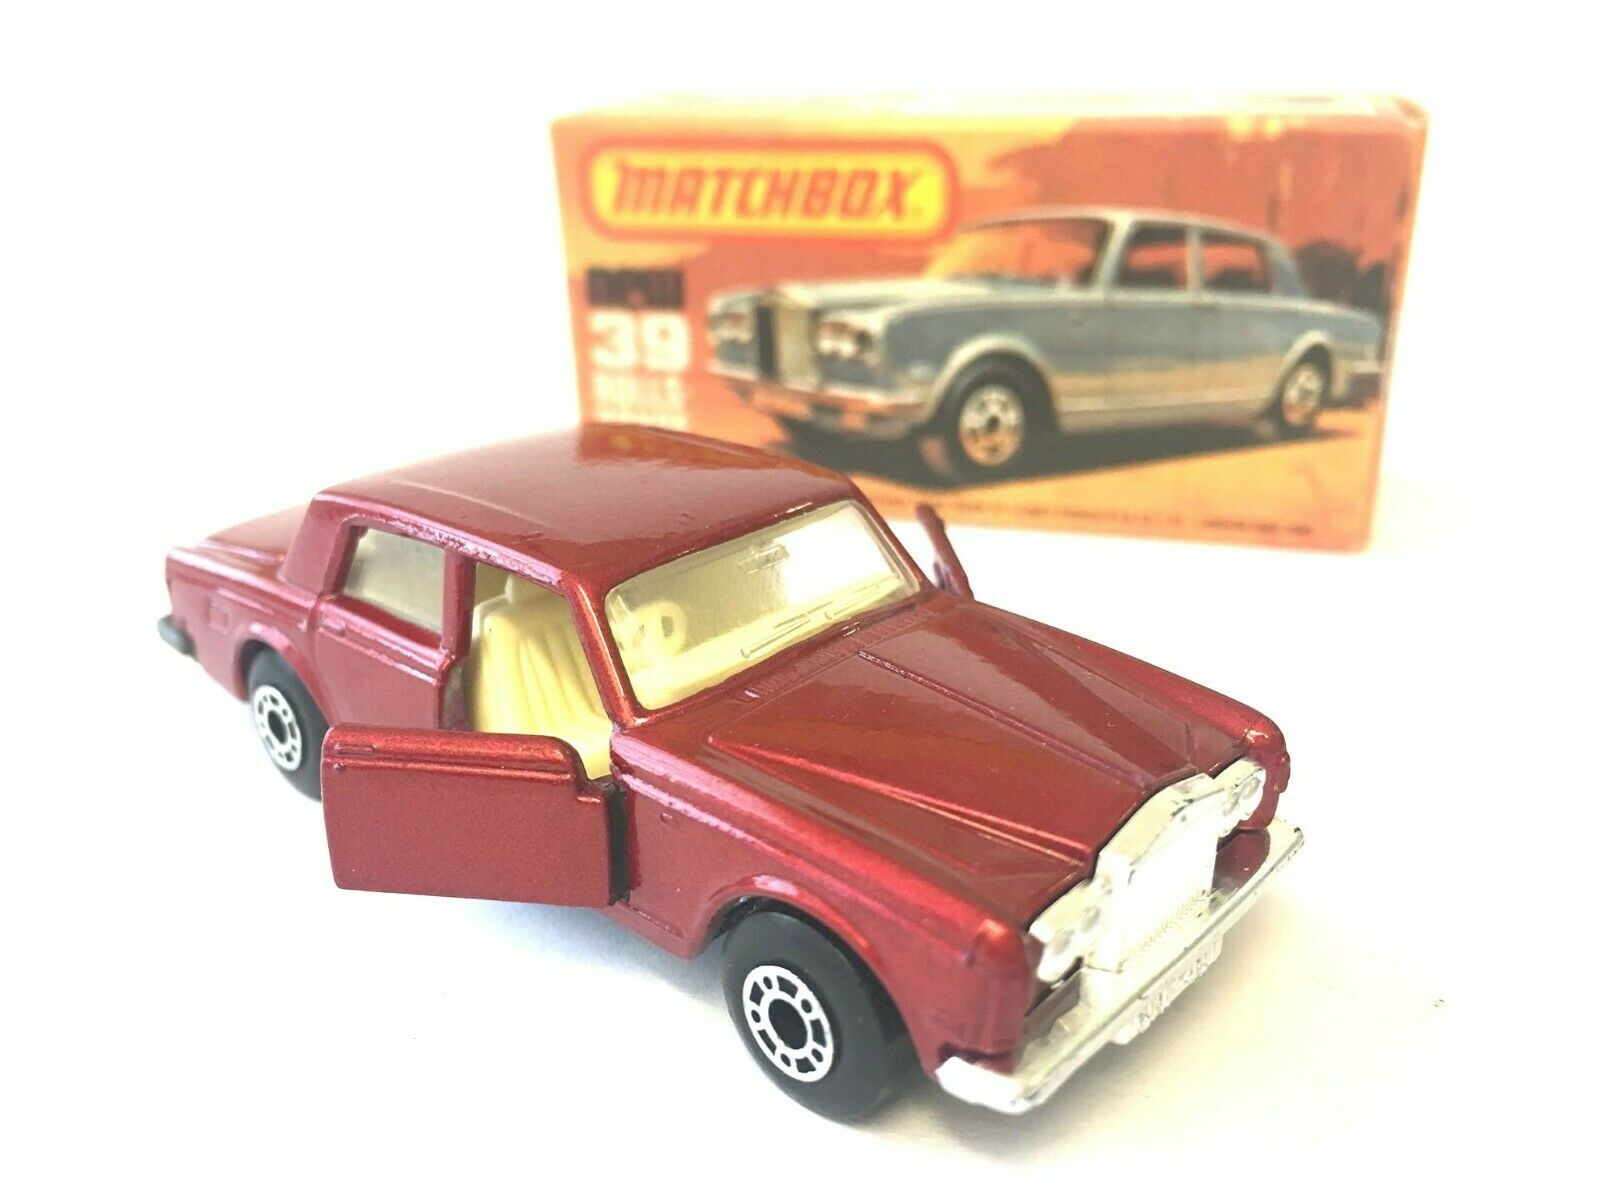 Matchbox 75 Superfast New 39 Rolls Royce Vintage in original Box